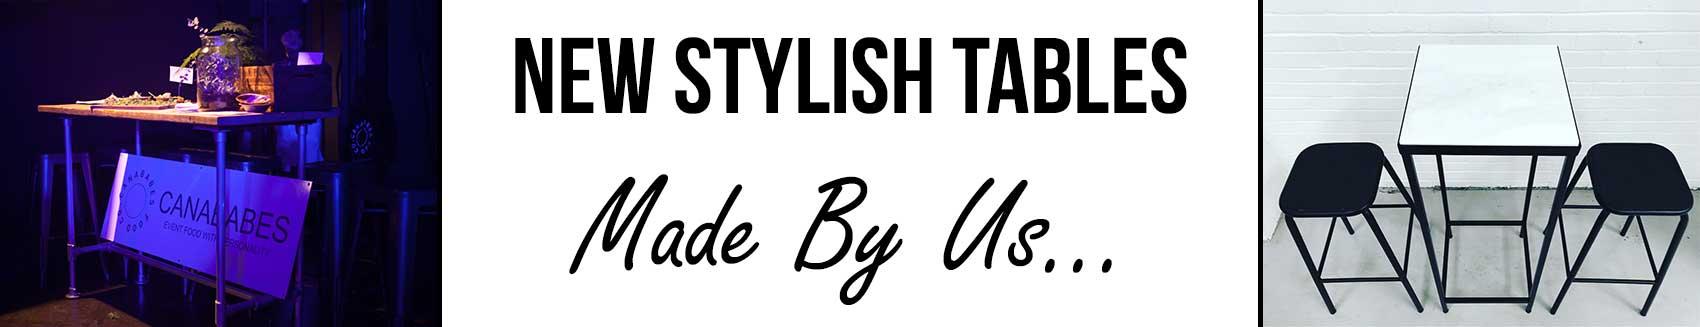 Stylish New Table Hire